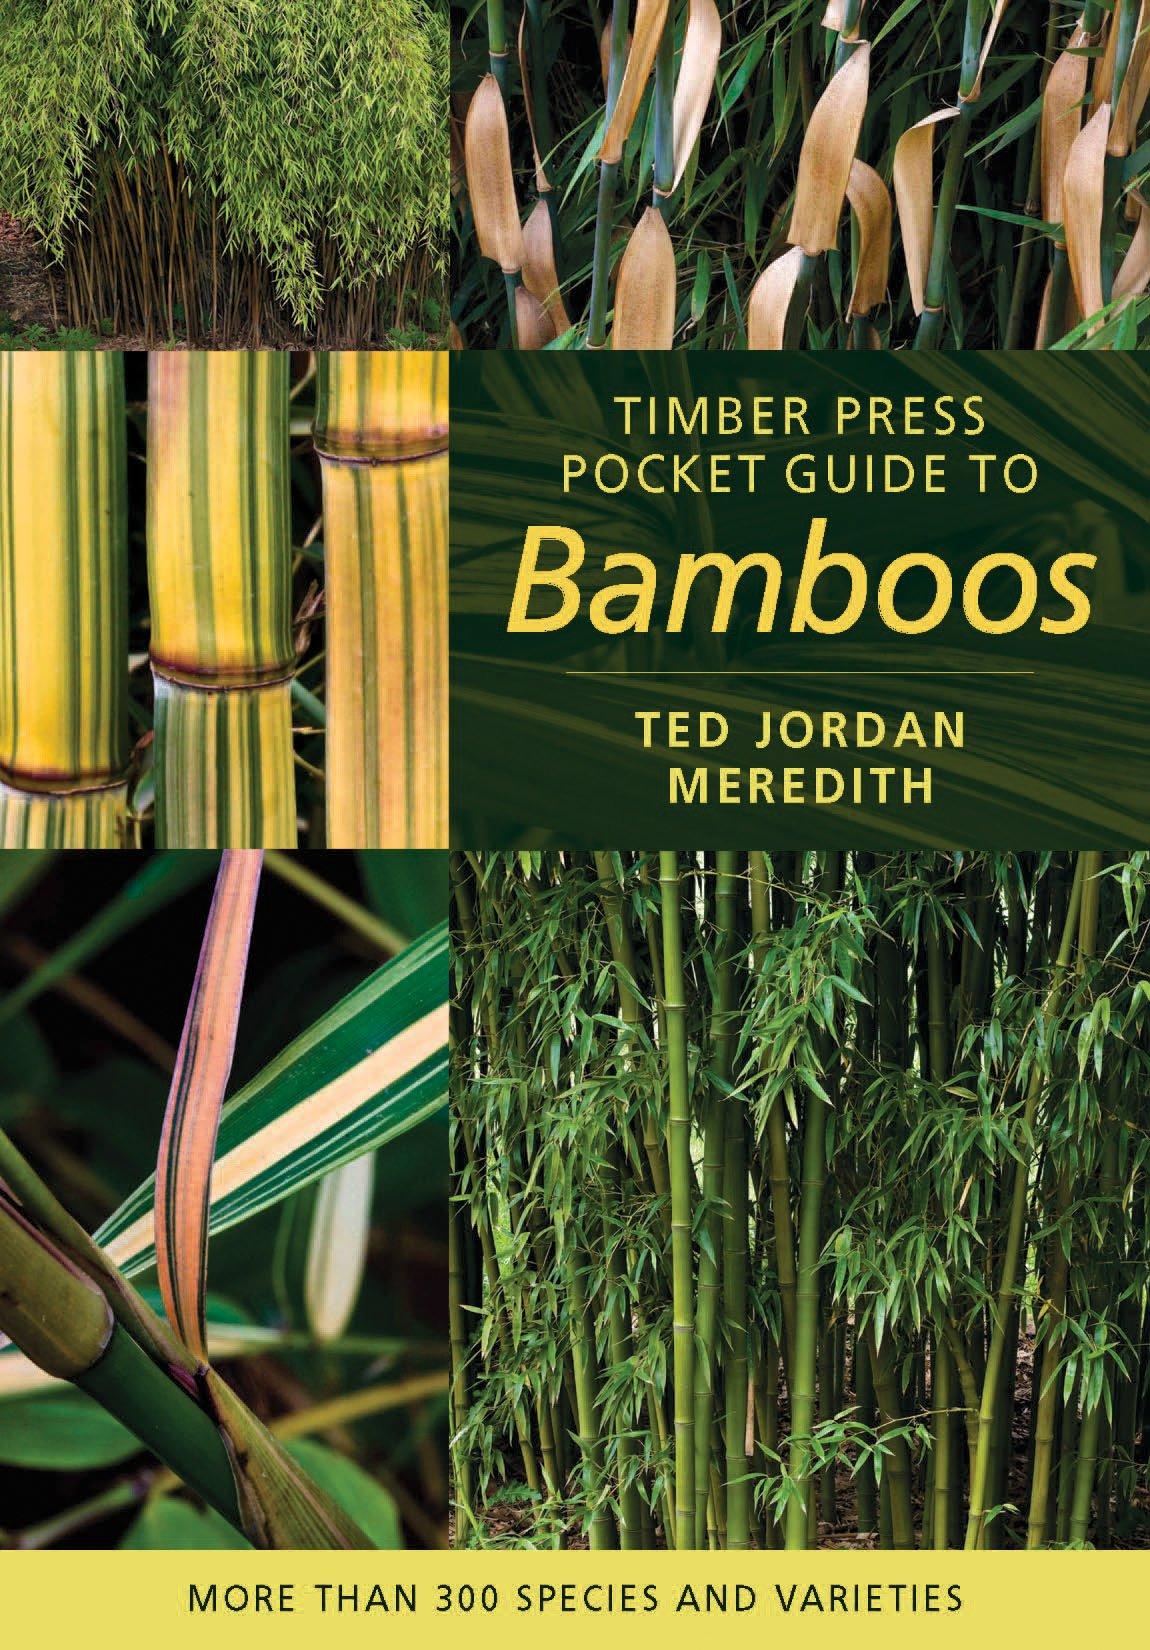 Timber Press Pocket Guide To Bamboos Ted Jordan Meredith